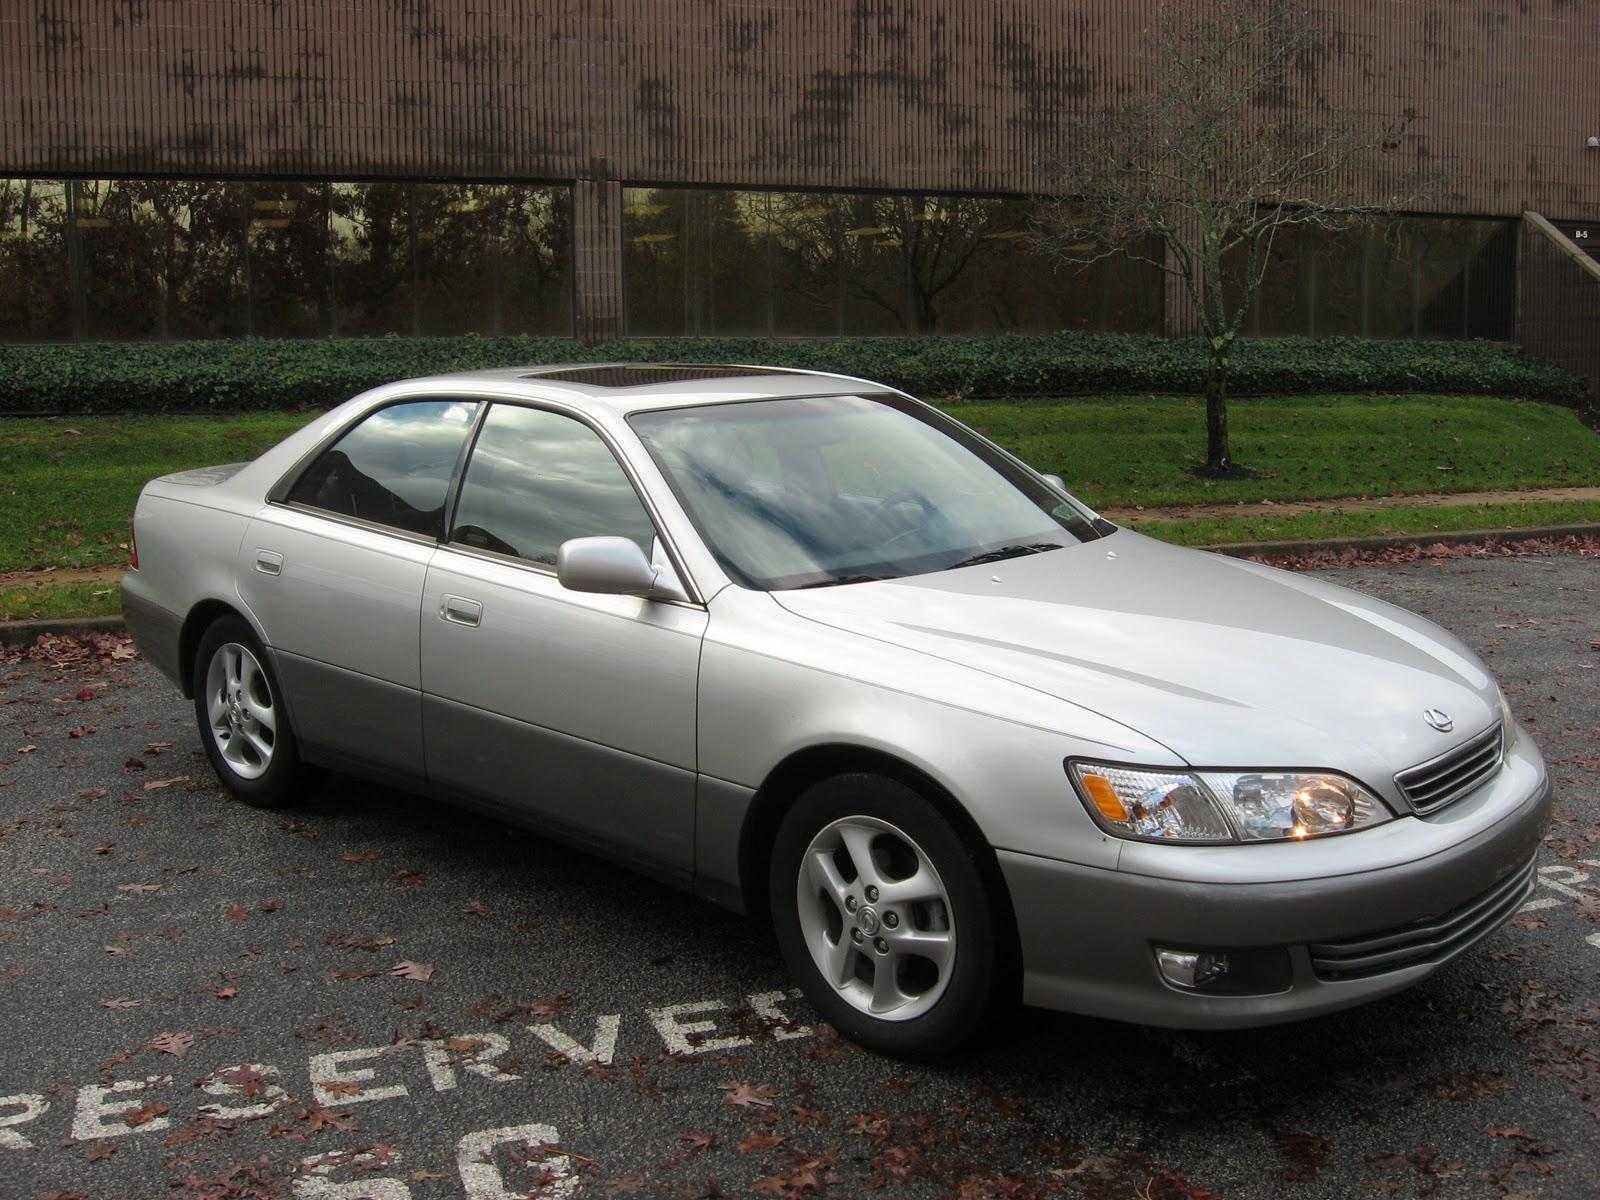 http://2.bp.blogspot.com/-0DM7g3mmhtw/TuFL52eBngI/AAAAAAAABKY/0r9yniTRLNg/s1600/Lexus+ES300+01+Sil+89k+002.jpg